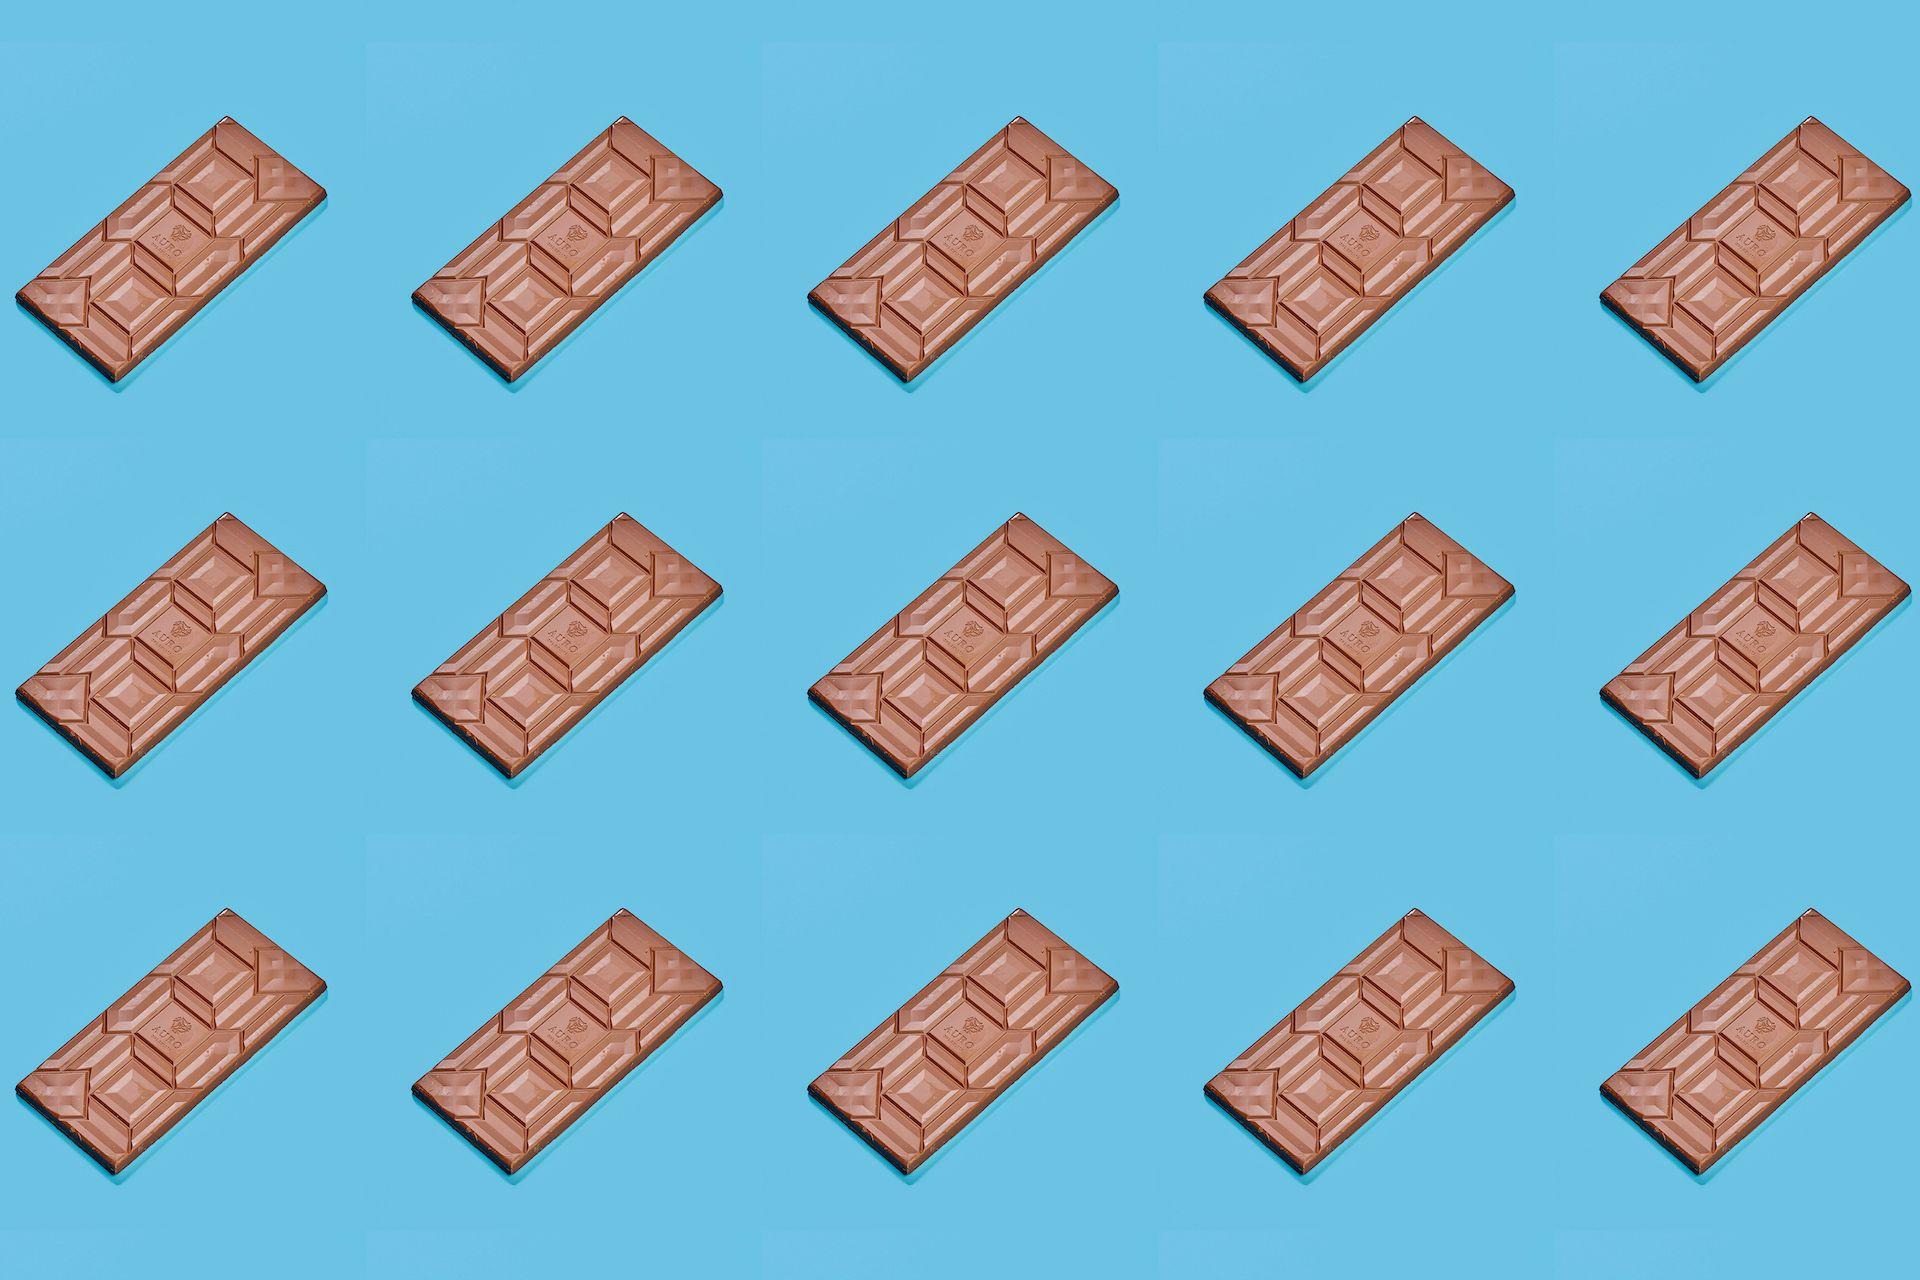 The Academy of Chocolate thinks Filipino tsokolate is among the world's best